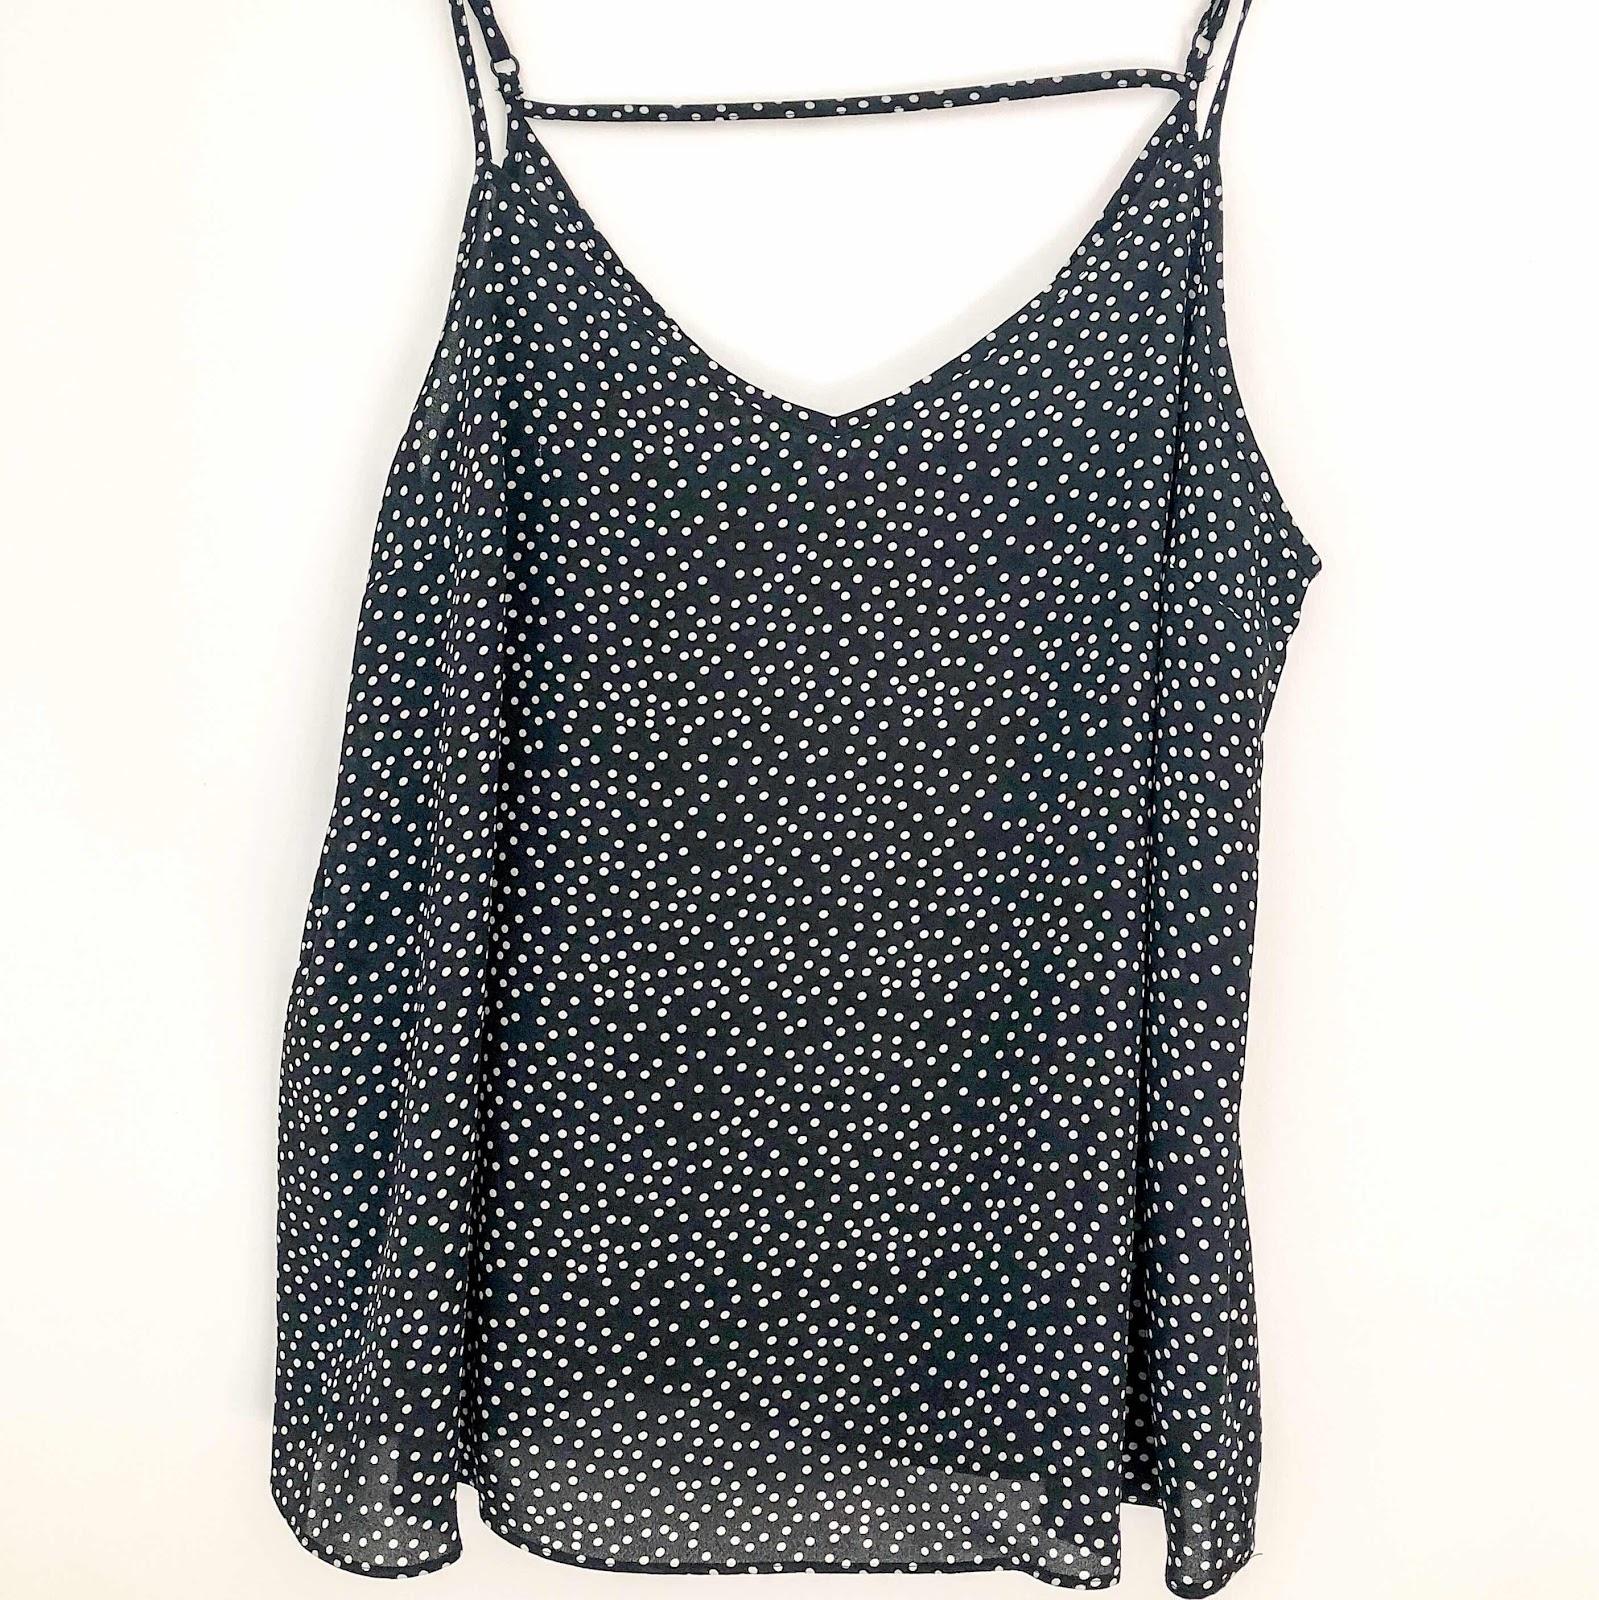 monthly-favourites-lifestyle-blog-fashion-primark-haul-polka-dot-cami